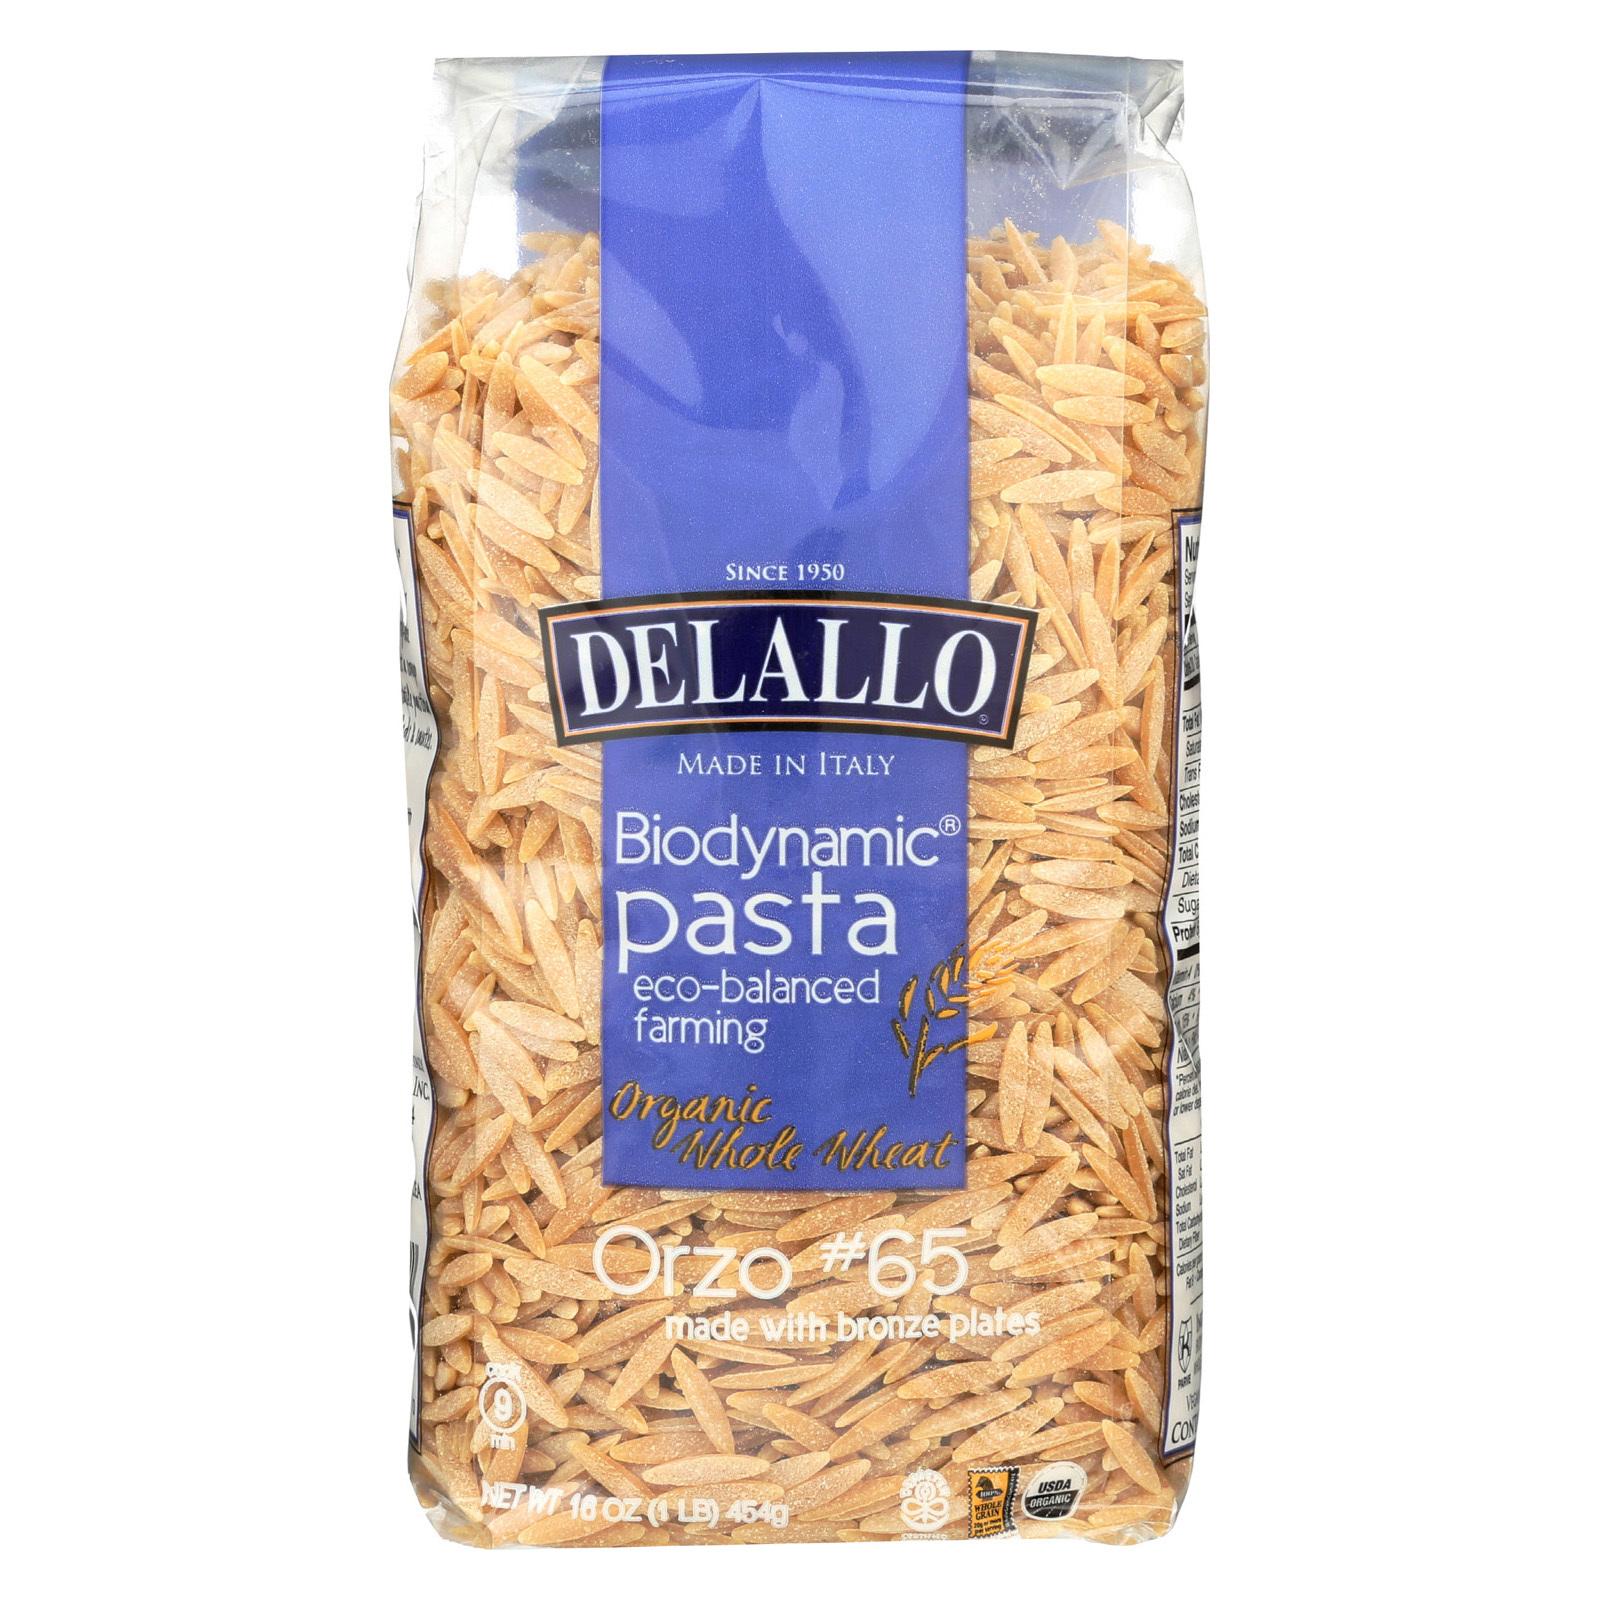 Delallo Biodynamic - Organic - Whole Wheat - Orzo - Case of 16 - 16 oz